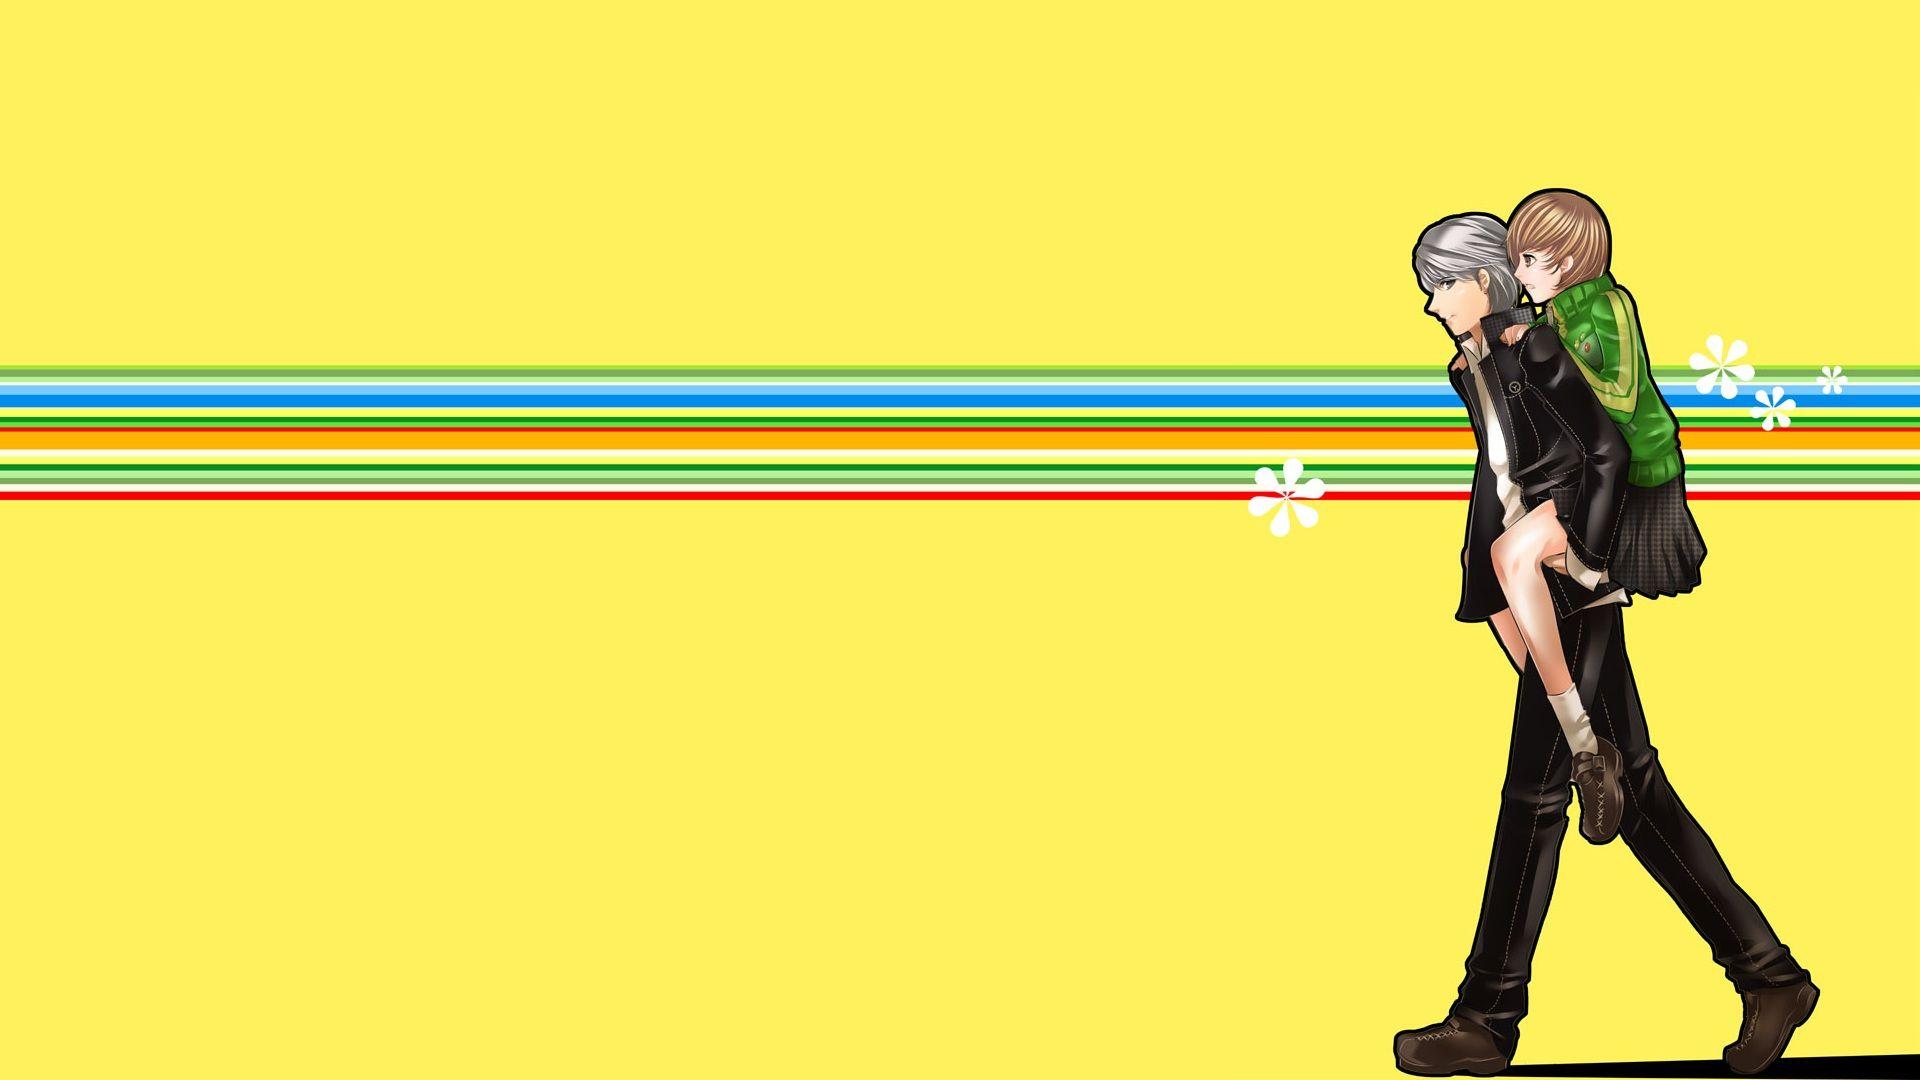 Persona 4 Wallpaper Persona 4 Wallpaper Persona 4 Persona